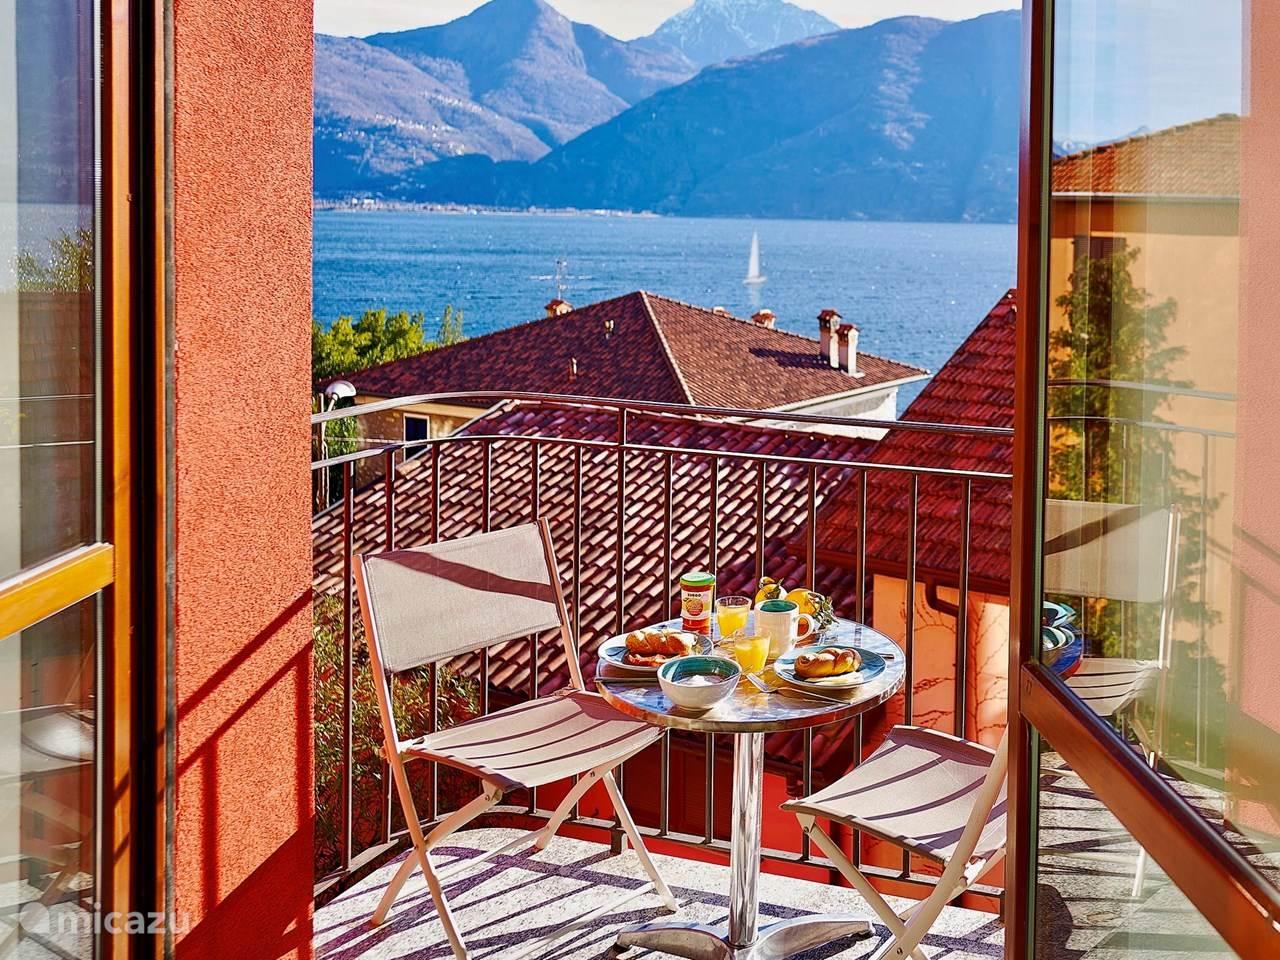 Lake View Apartment lake Como Le Quattro Stagioni – Lake